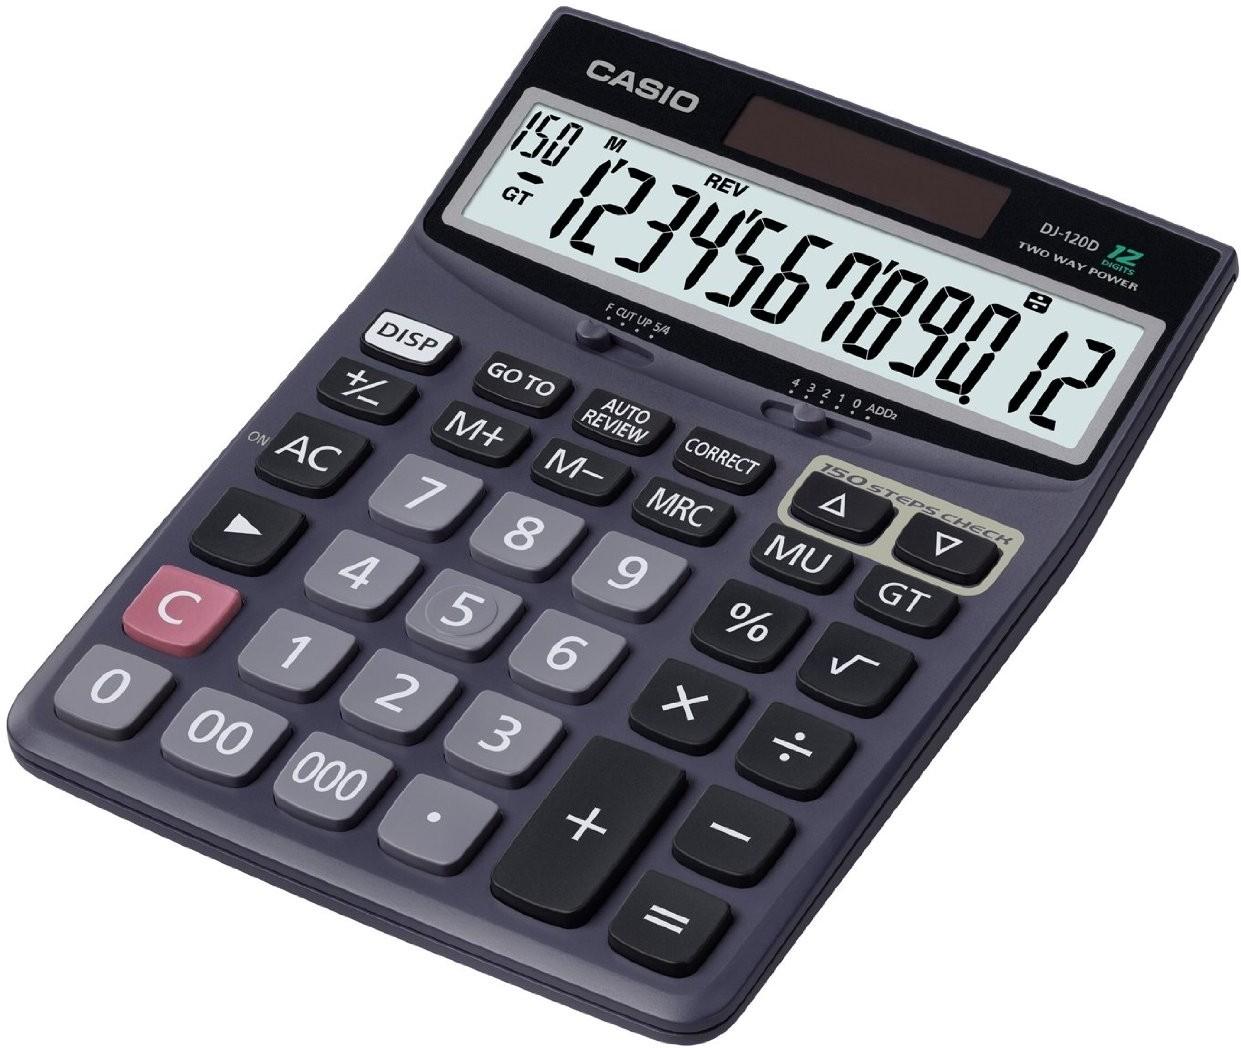 http://img6a.flixcart.com/image/calculator/f/3/4/casio-mj-120d-bulk-mj-120d-bulk-original-imadvwx2erghawwt.jpeg